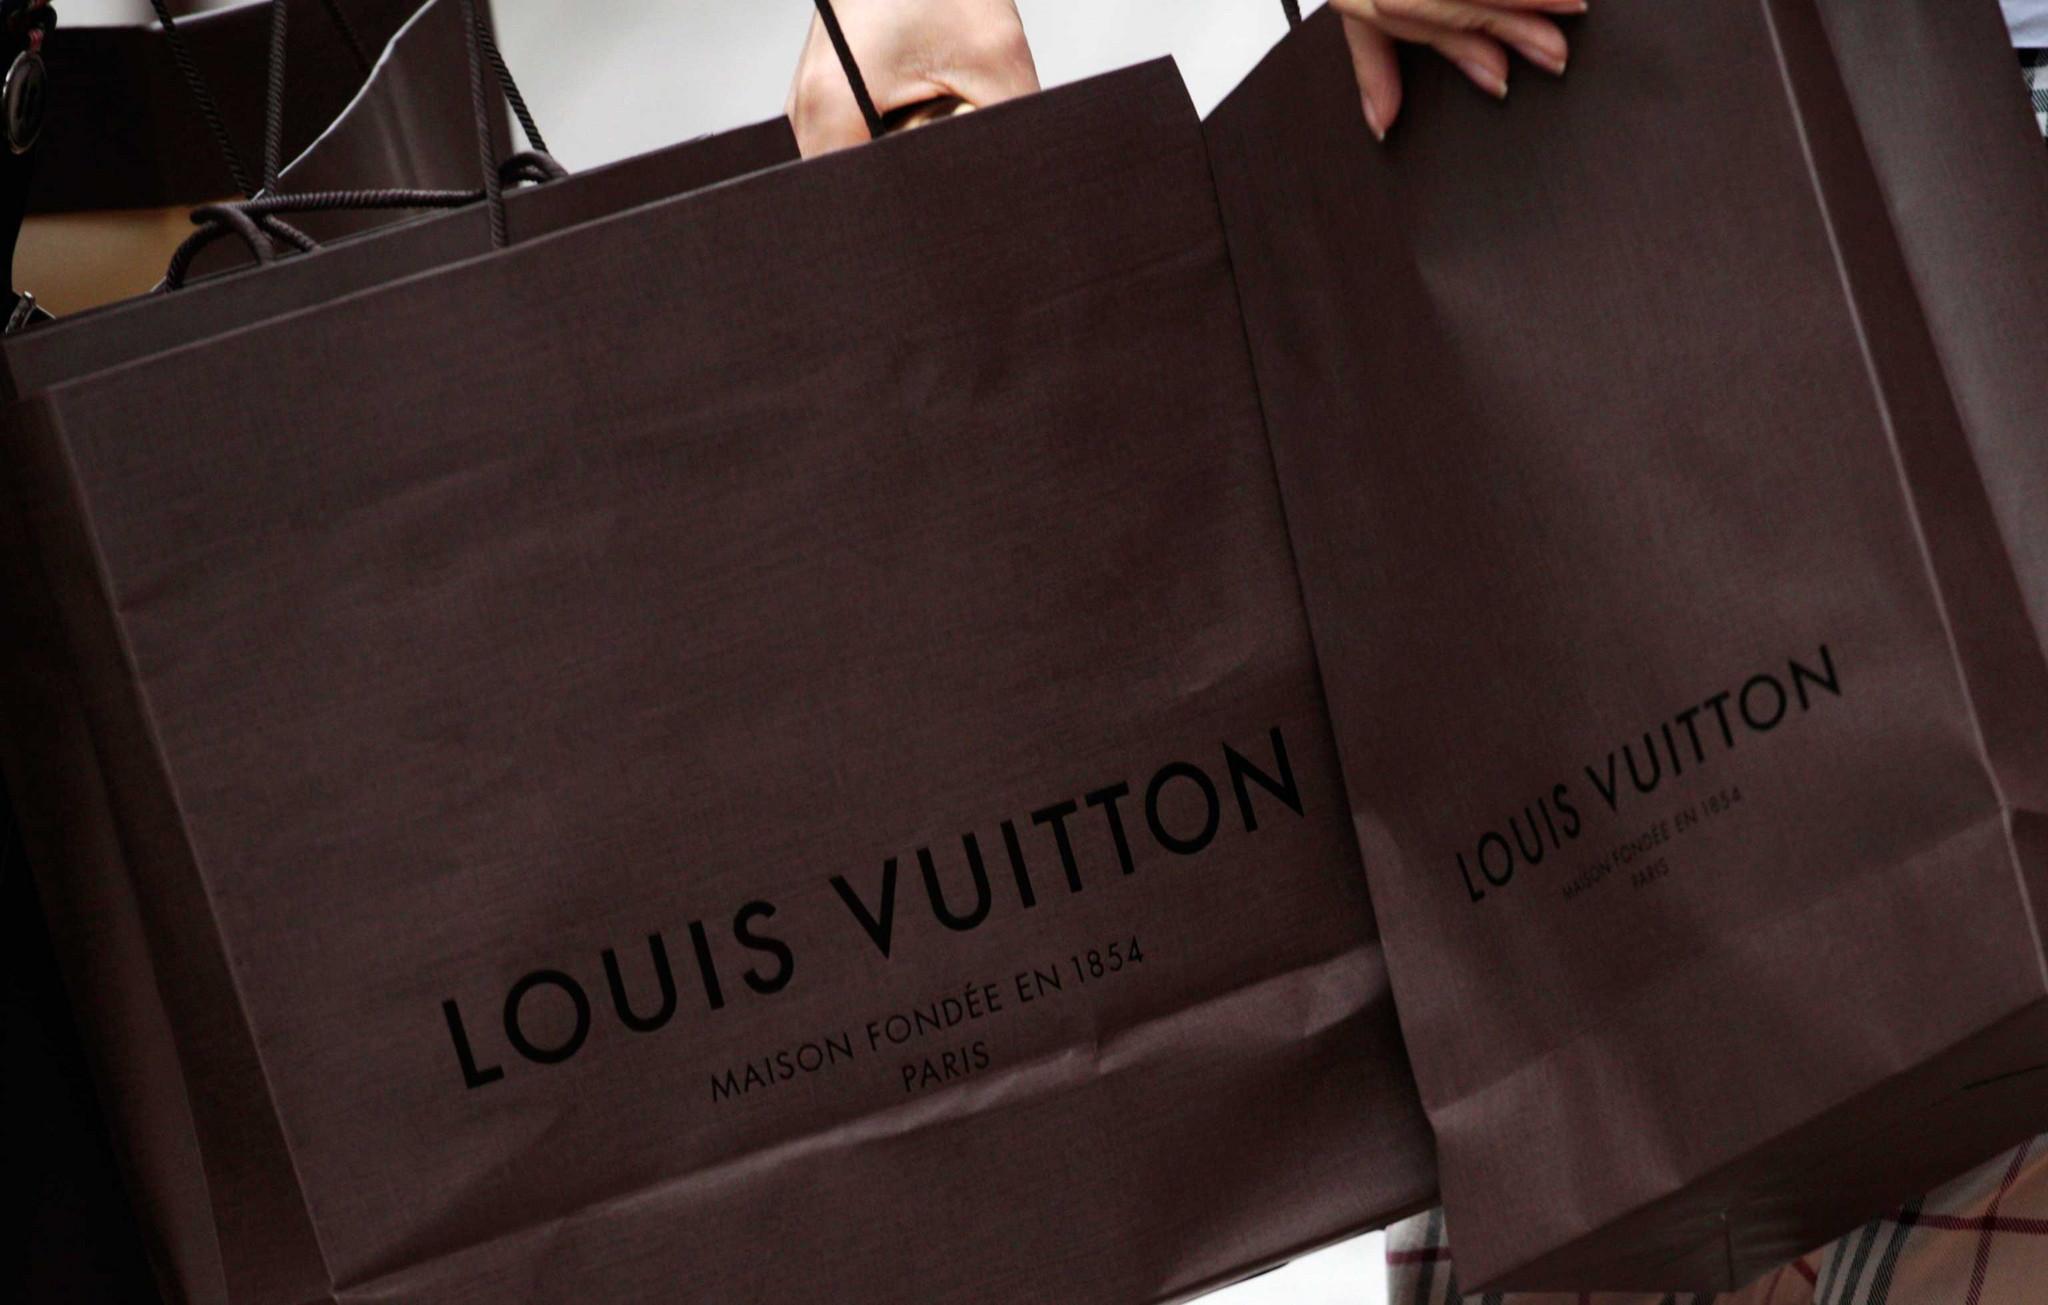 Vuitton-foto-ReutersWeb.jpg